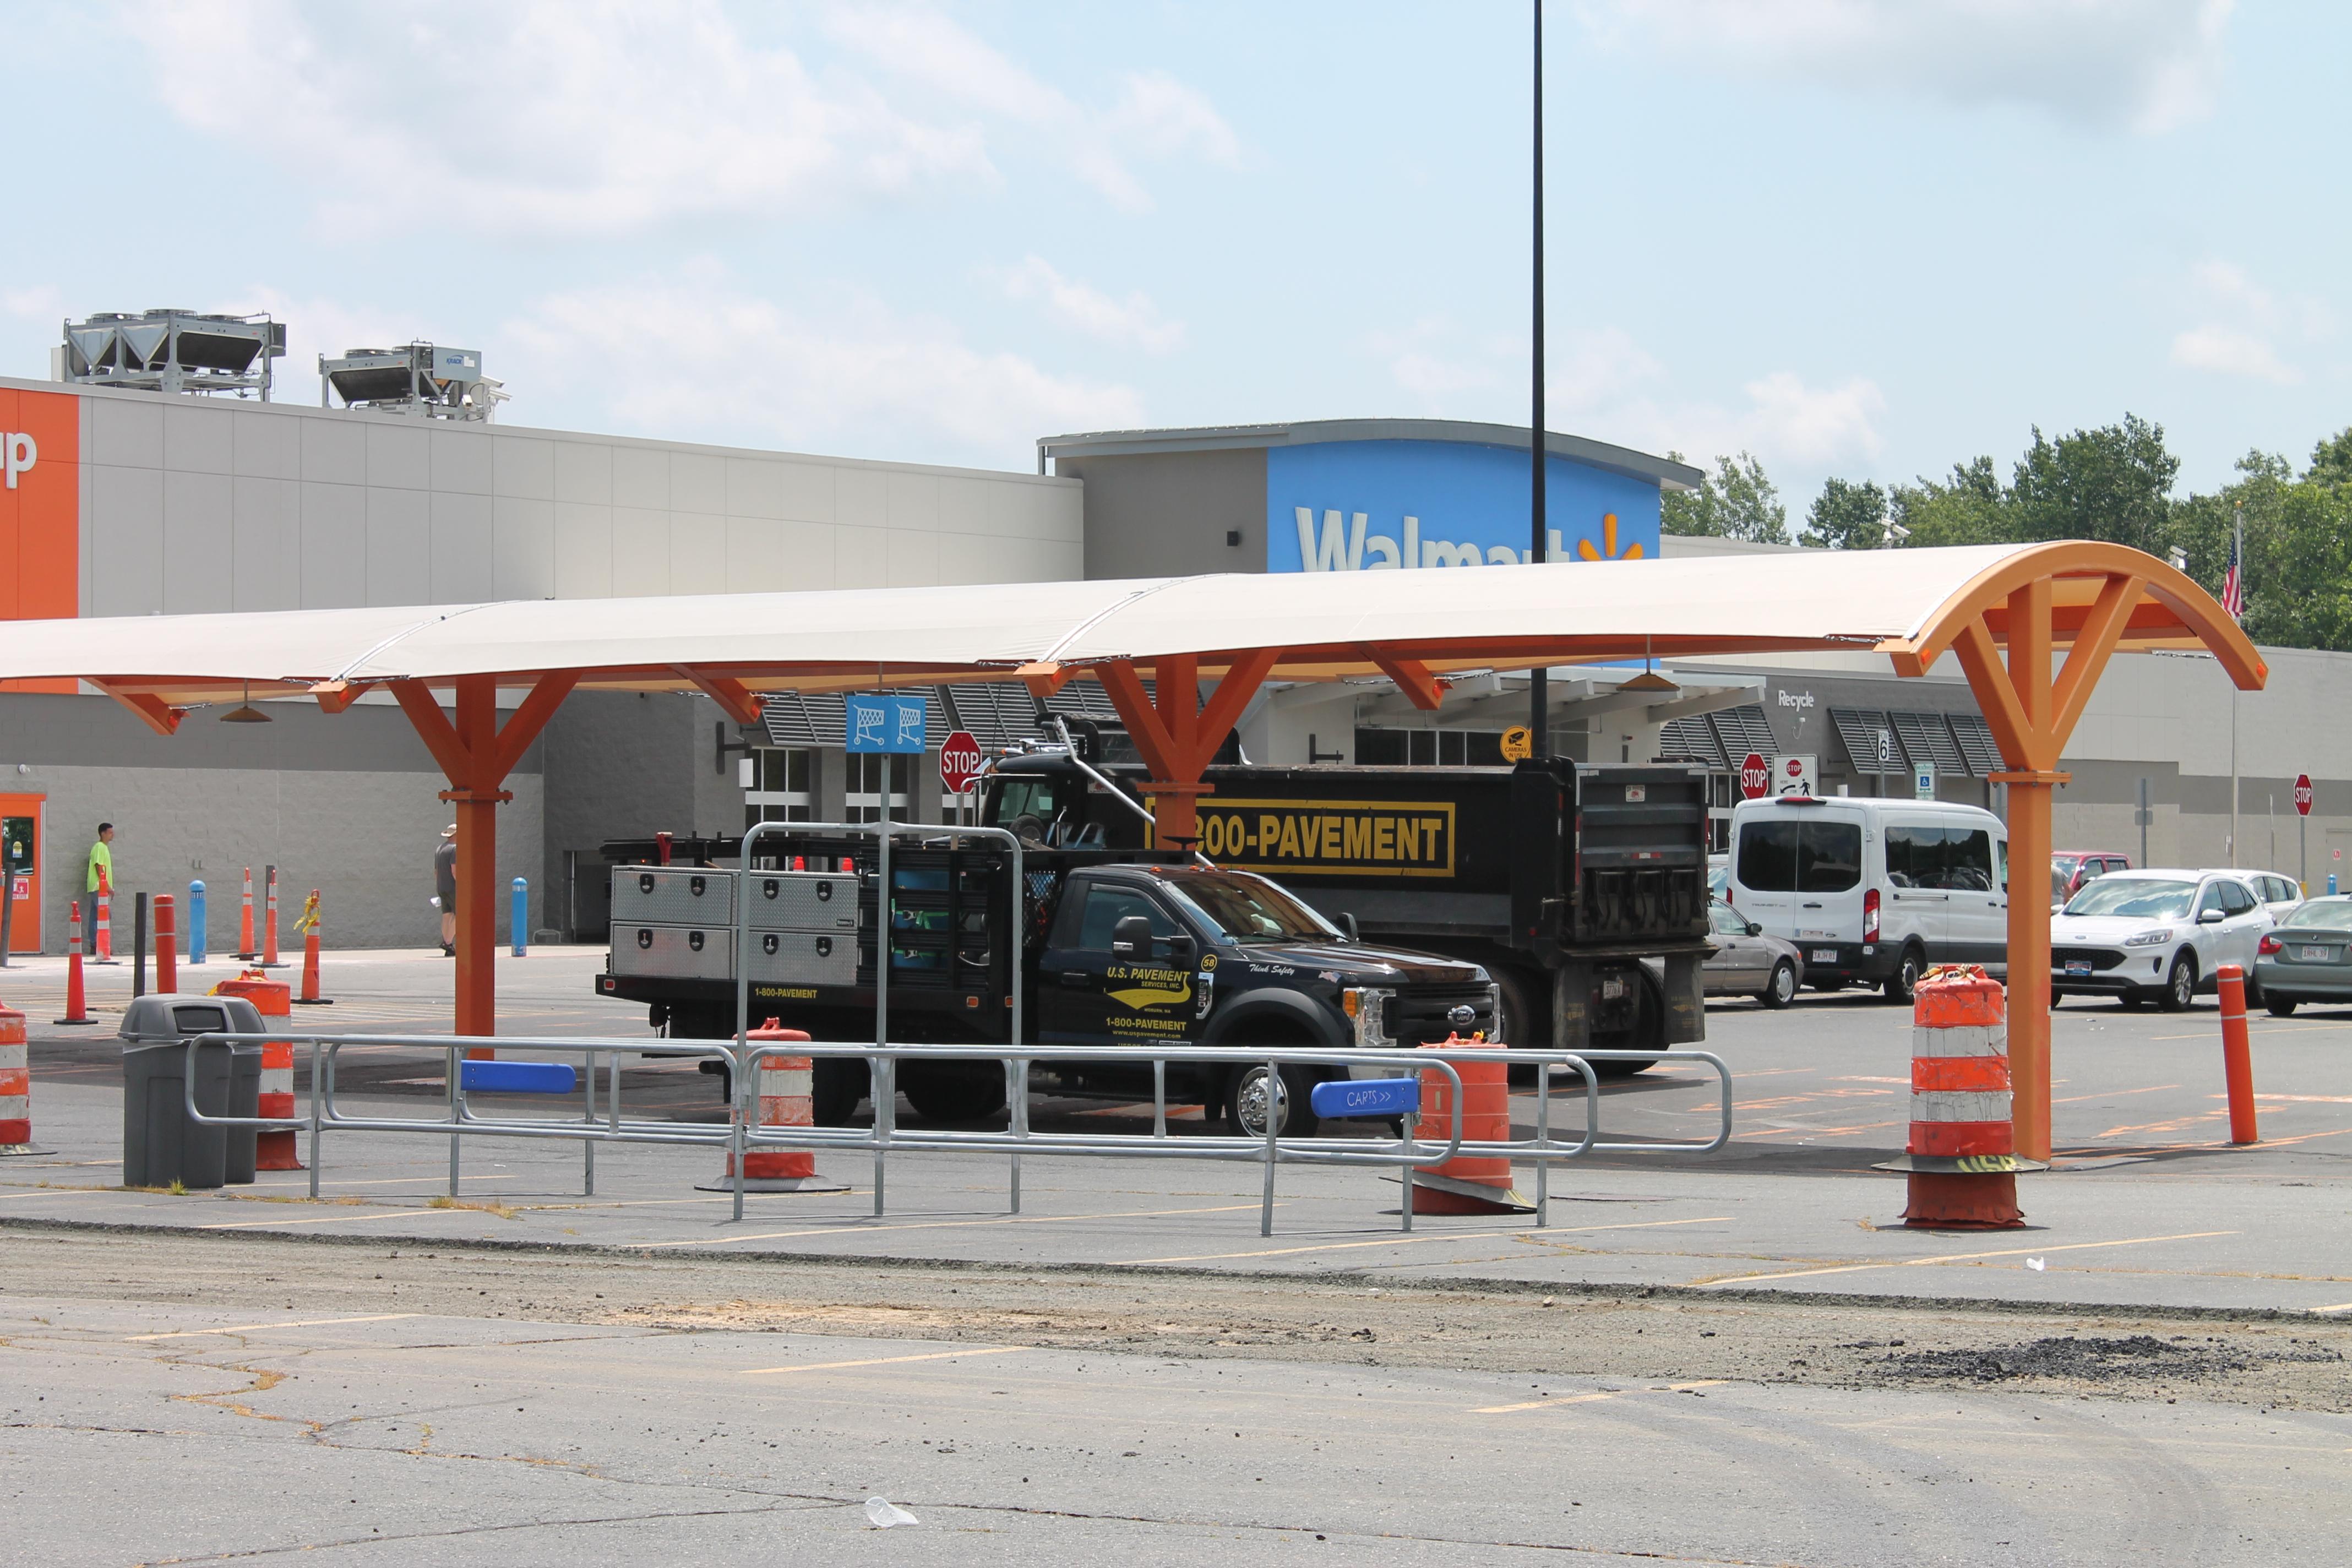 walmart big box retailer parking lot maintenance